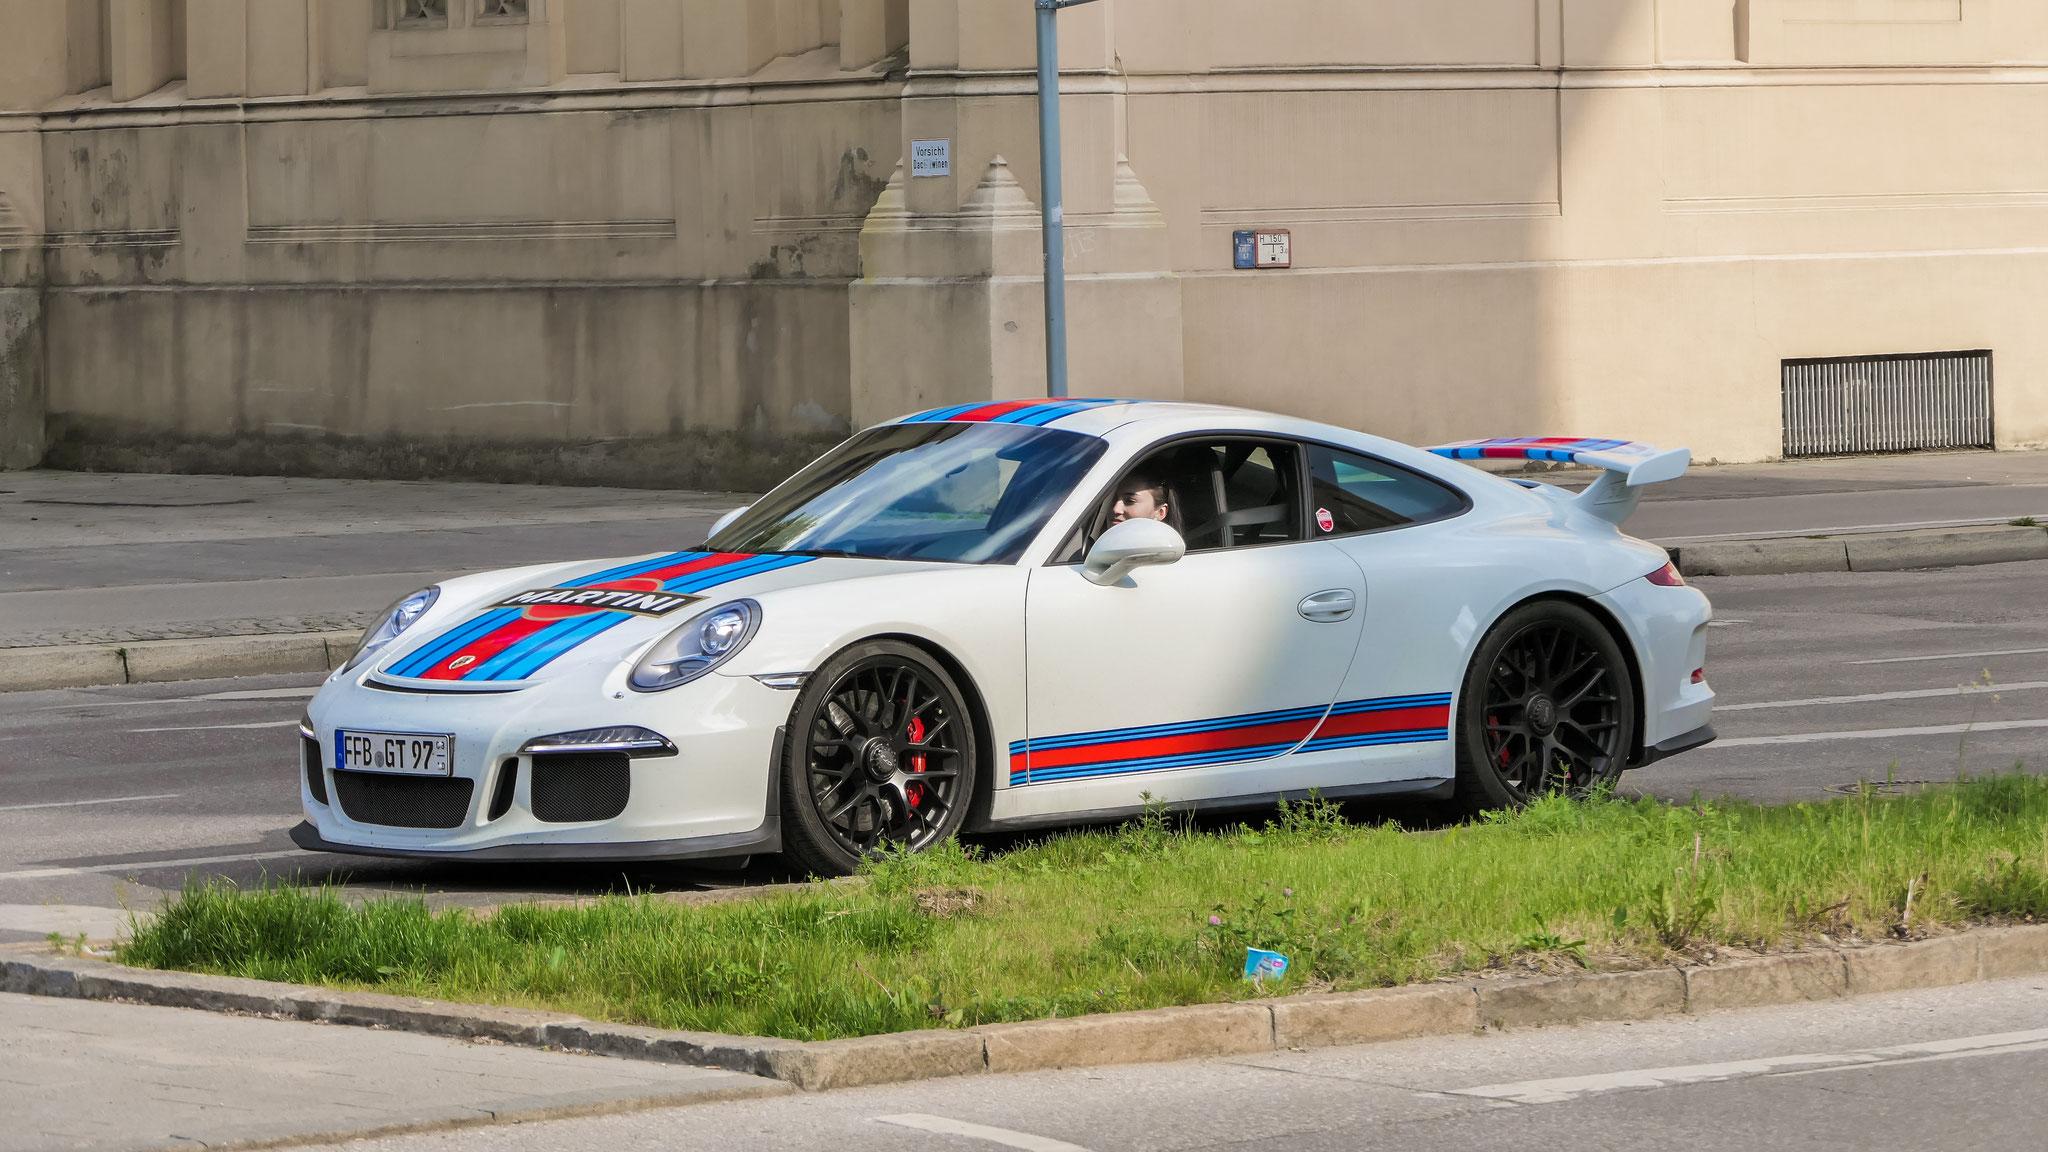 Porsche 991 GT3 - FFB-GT-97